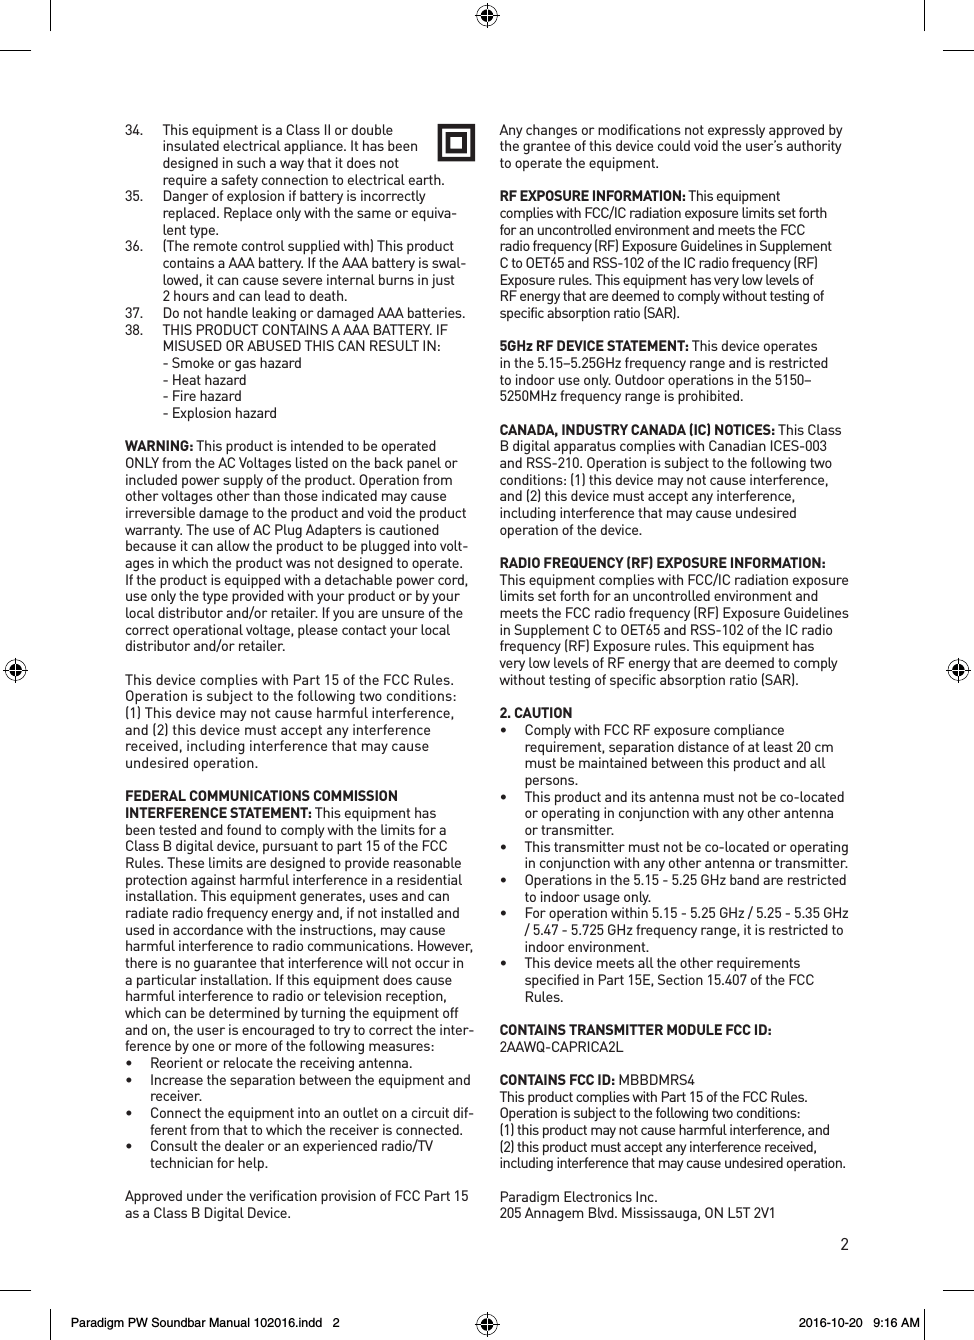 Anam Electronics PWSOUNDBAR SOUNDBAR User Manual